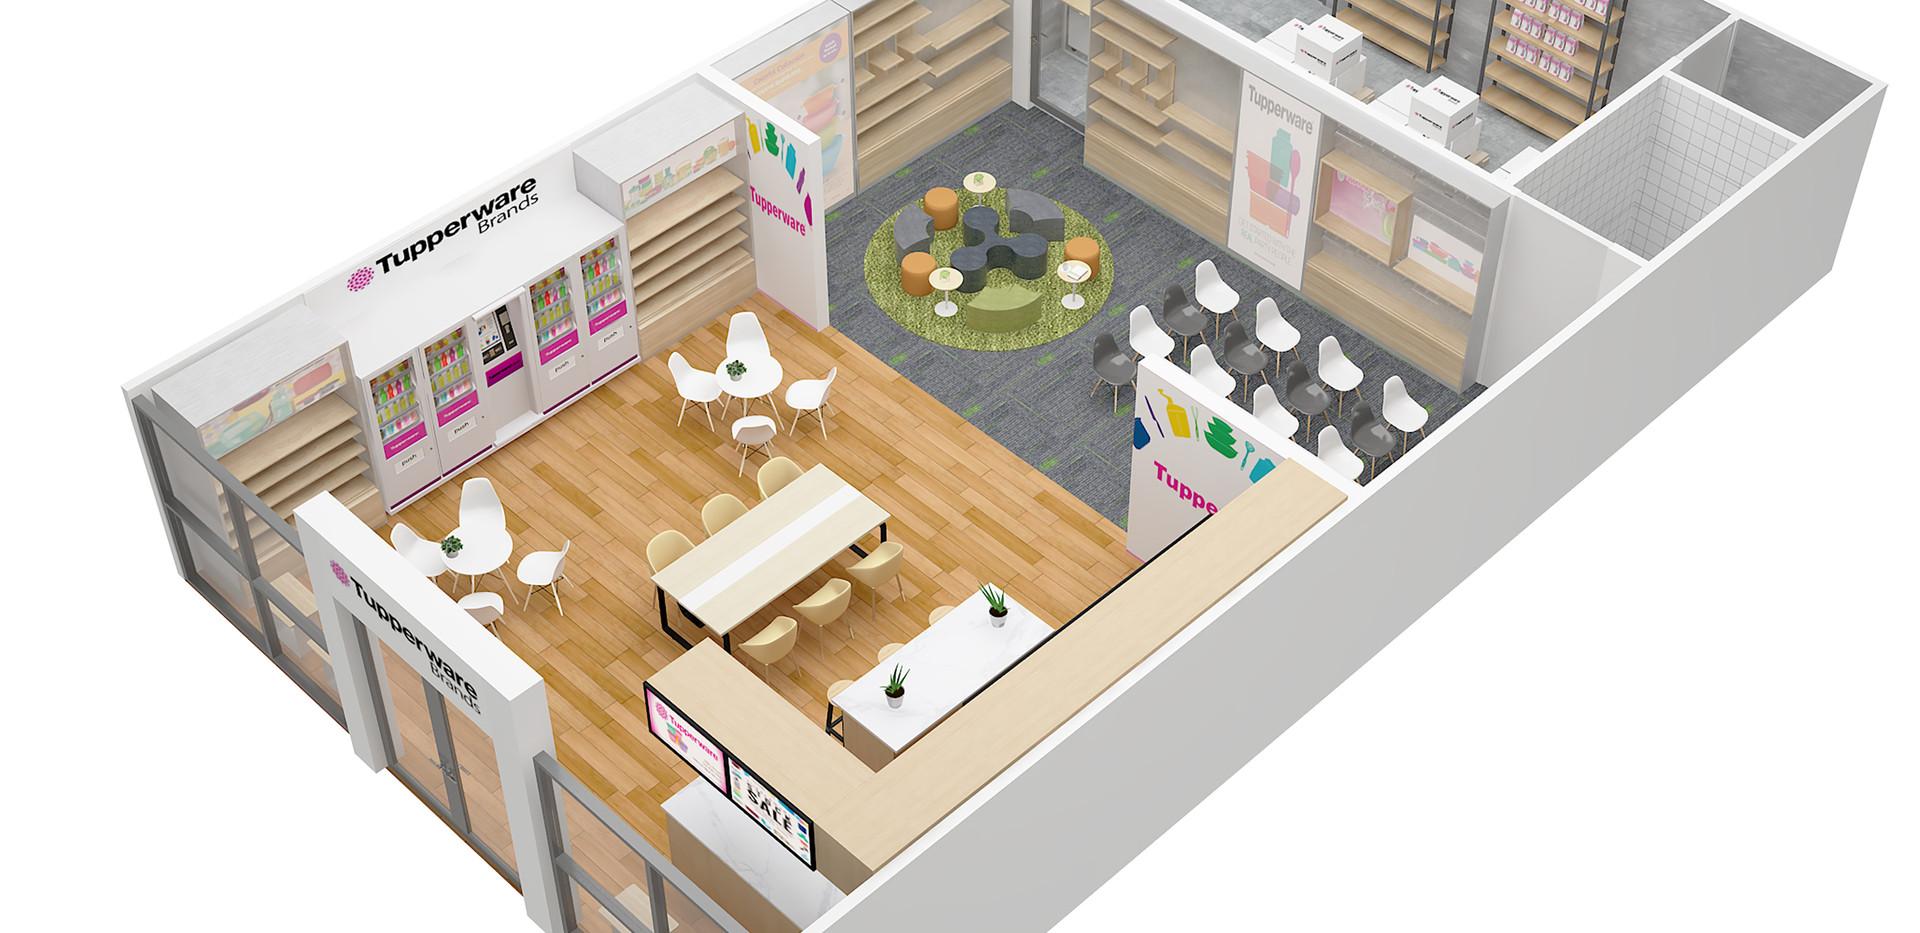 3D Floor plan_tupperware_view 2_3D.jpg